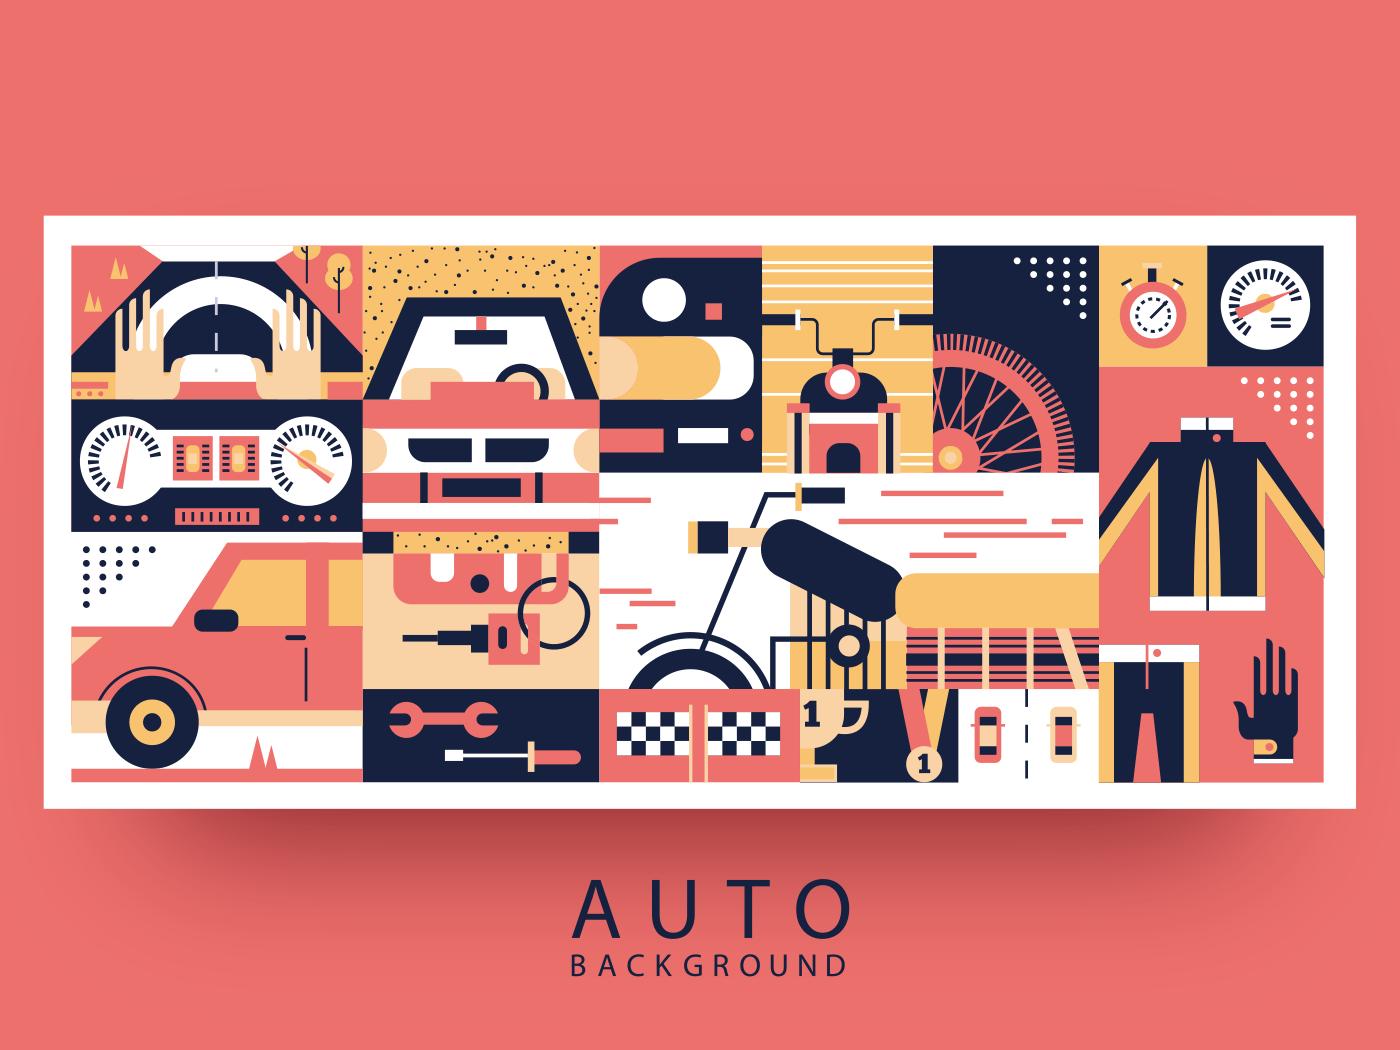 Auto and moto background flat vector illustration